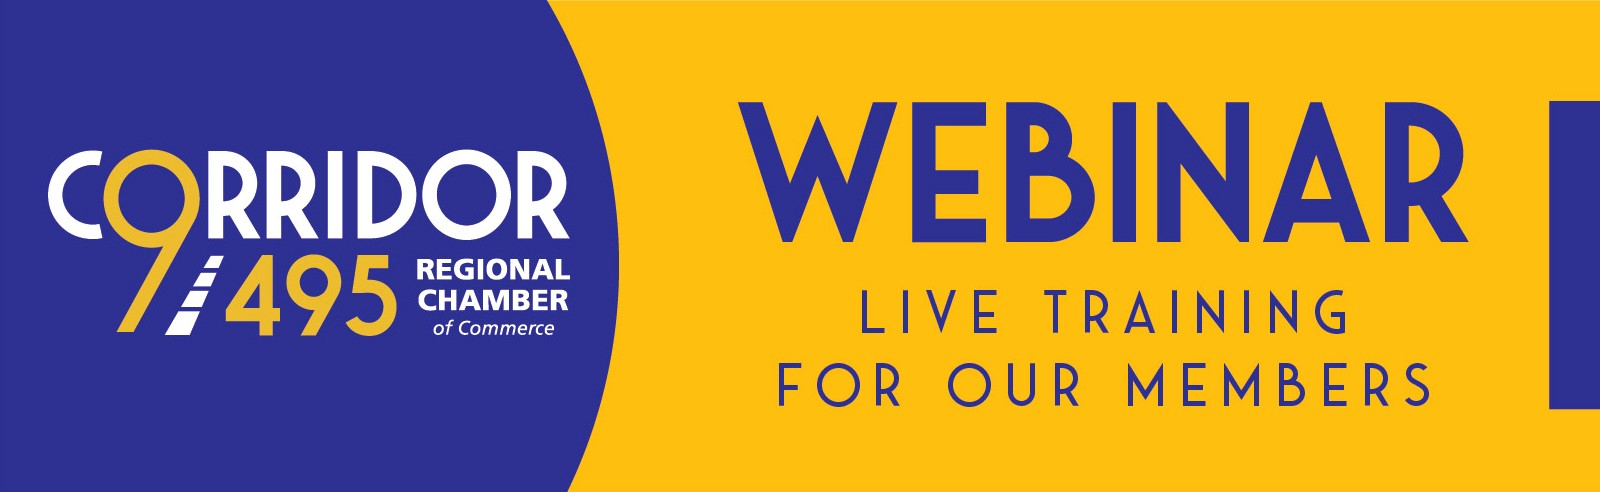 webinar new logo